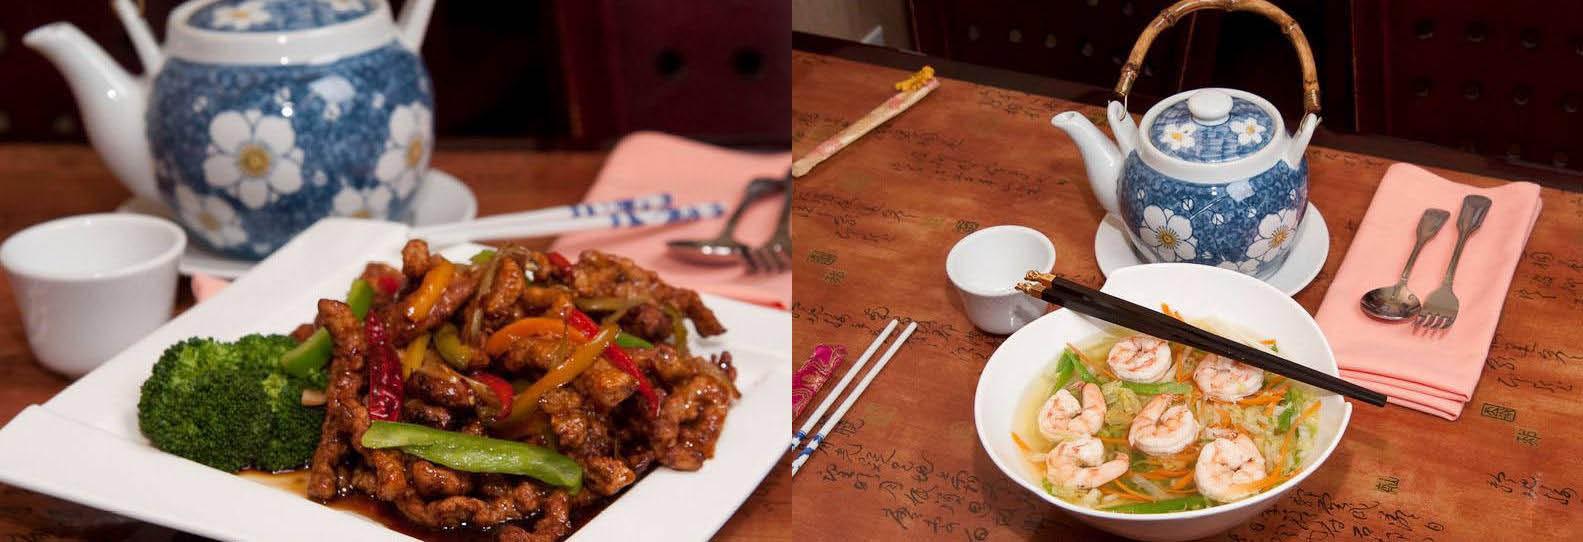 Chinese Food Coupons - Chinese Food Coupons Montclair, NJ